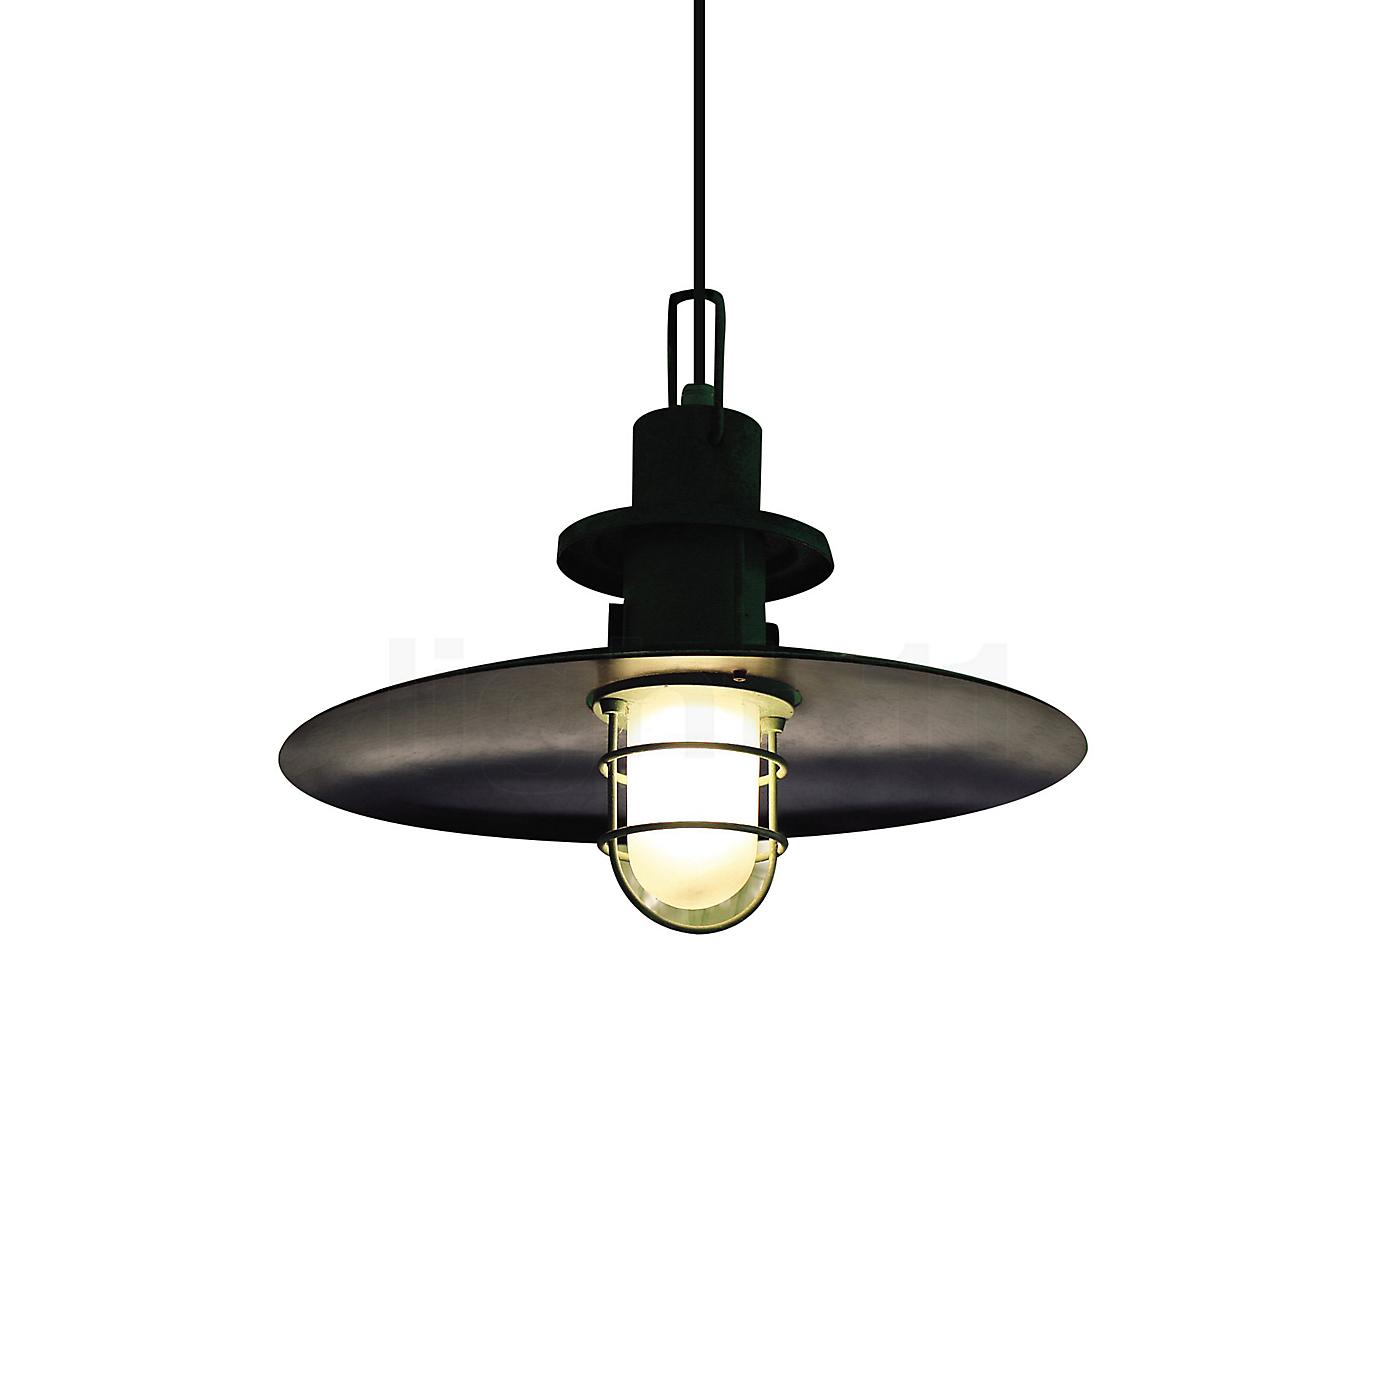 Illuminazione sospensione ufficio: lampada a sospensione egoluce ...